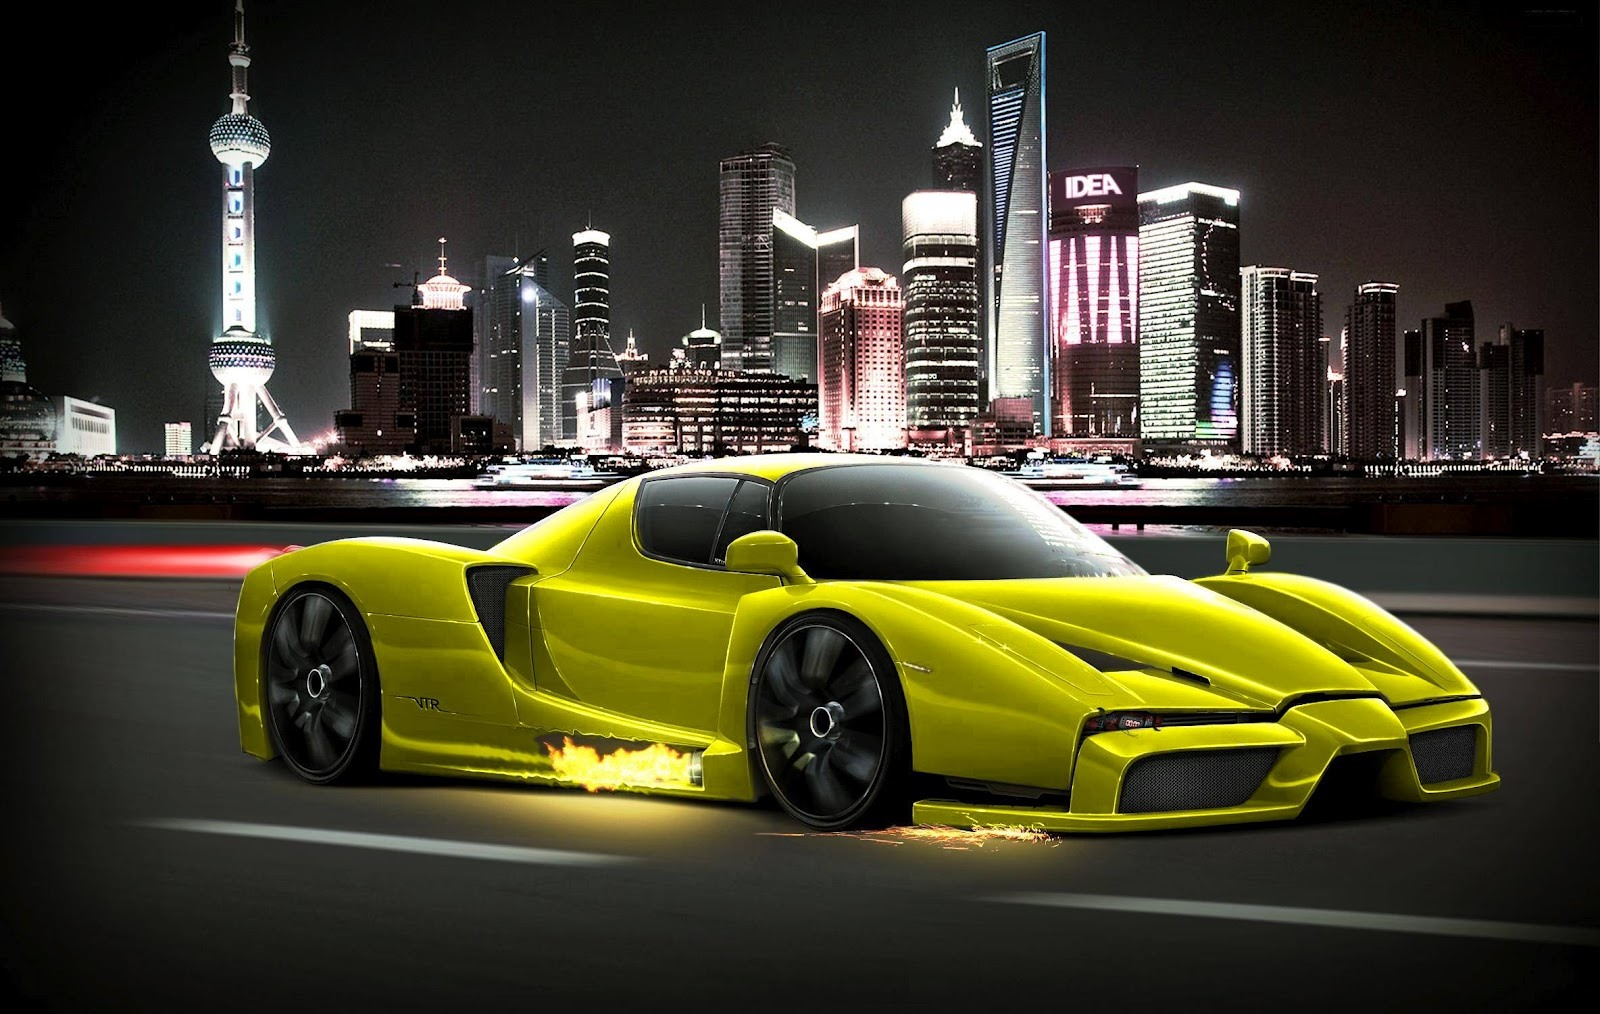 Image For Ferrari Car Hd High Definition Wallpaper Pudong Skyline 1600x1014 Wallpaper Teahub Io